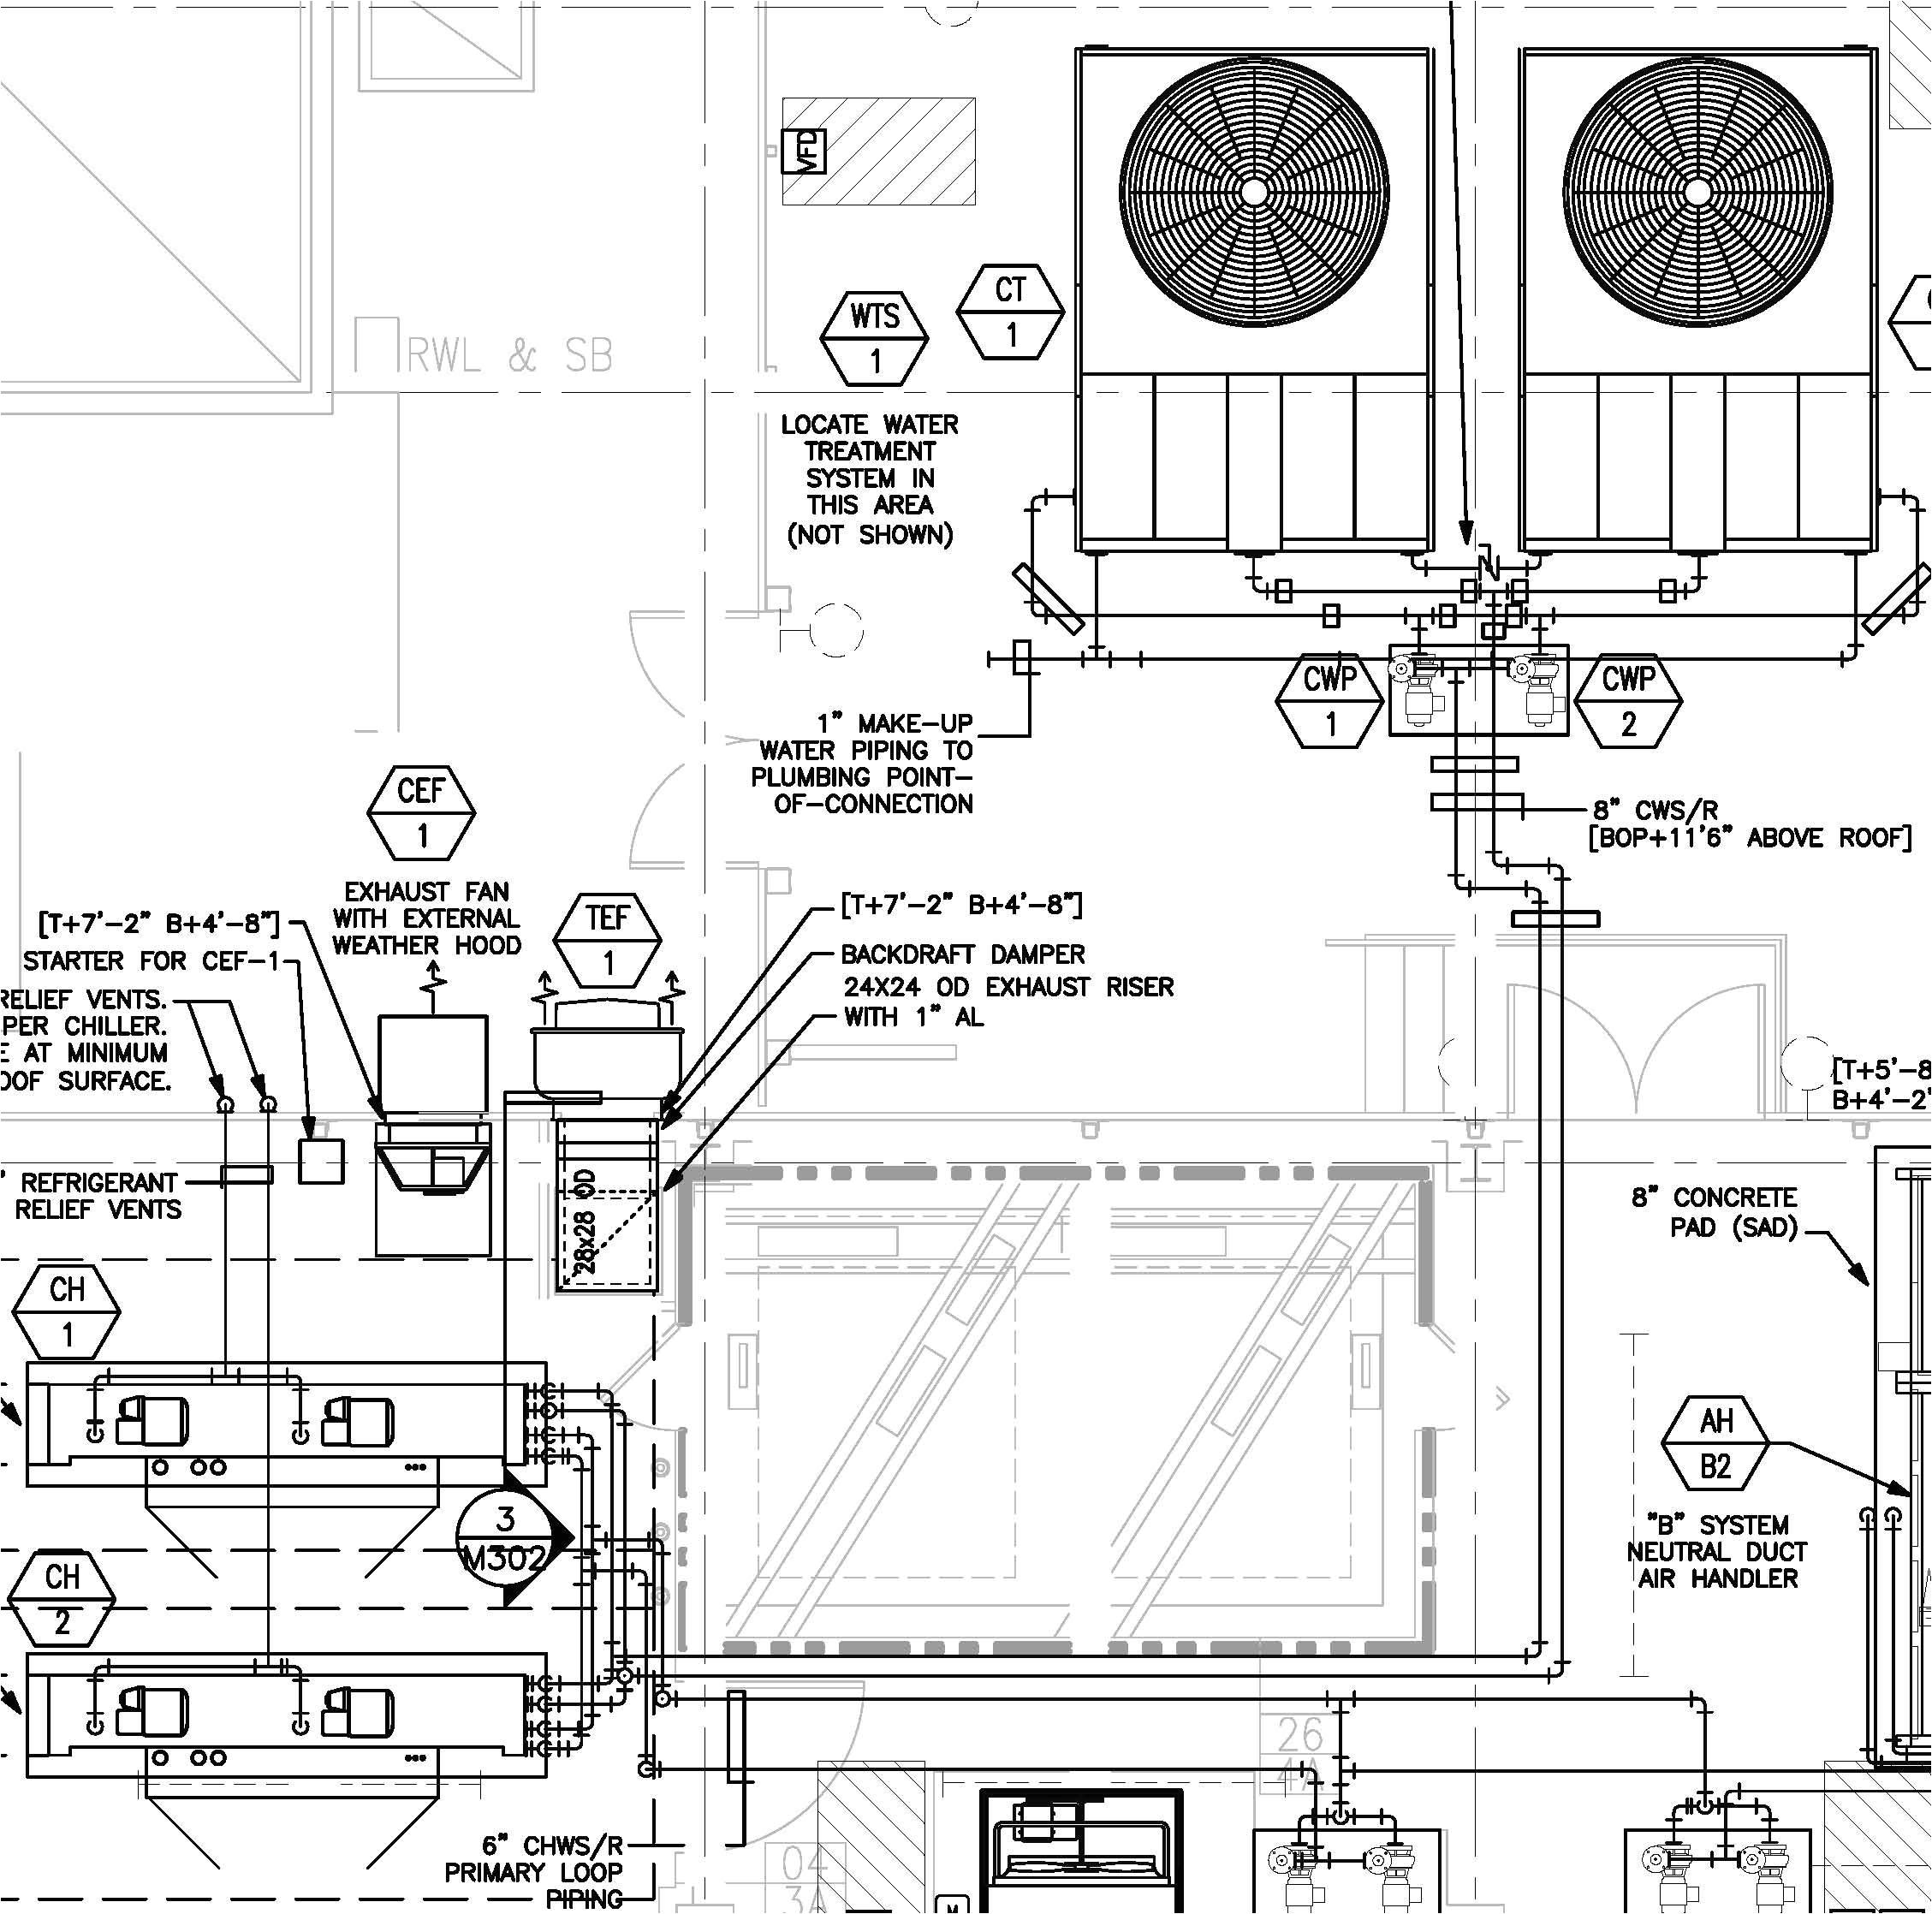 Kymco Super 8 Wiring Diagram Wiring Komatsu Schematics fork Lift Fb13m Wiring Diagram Used